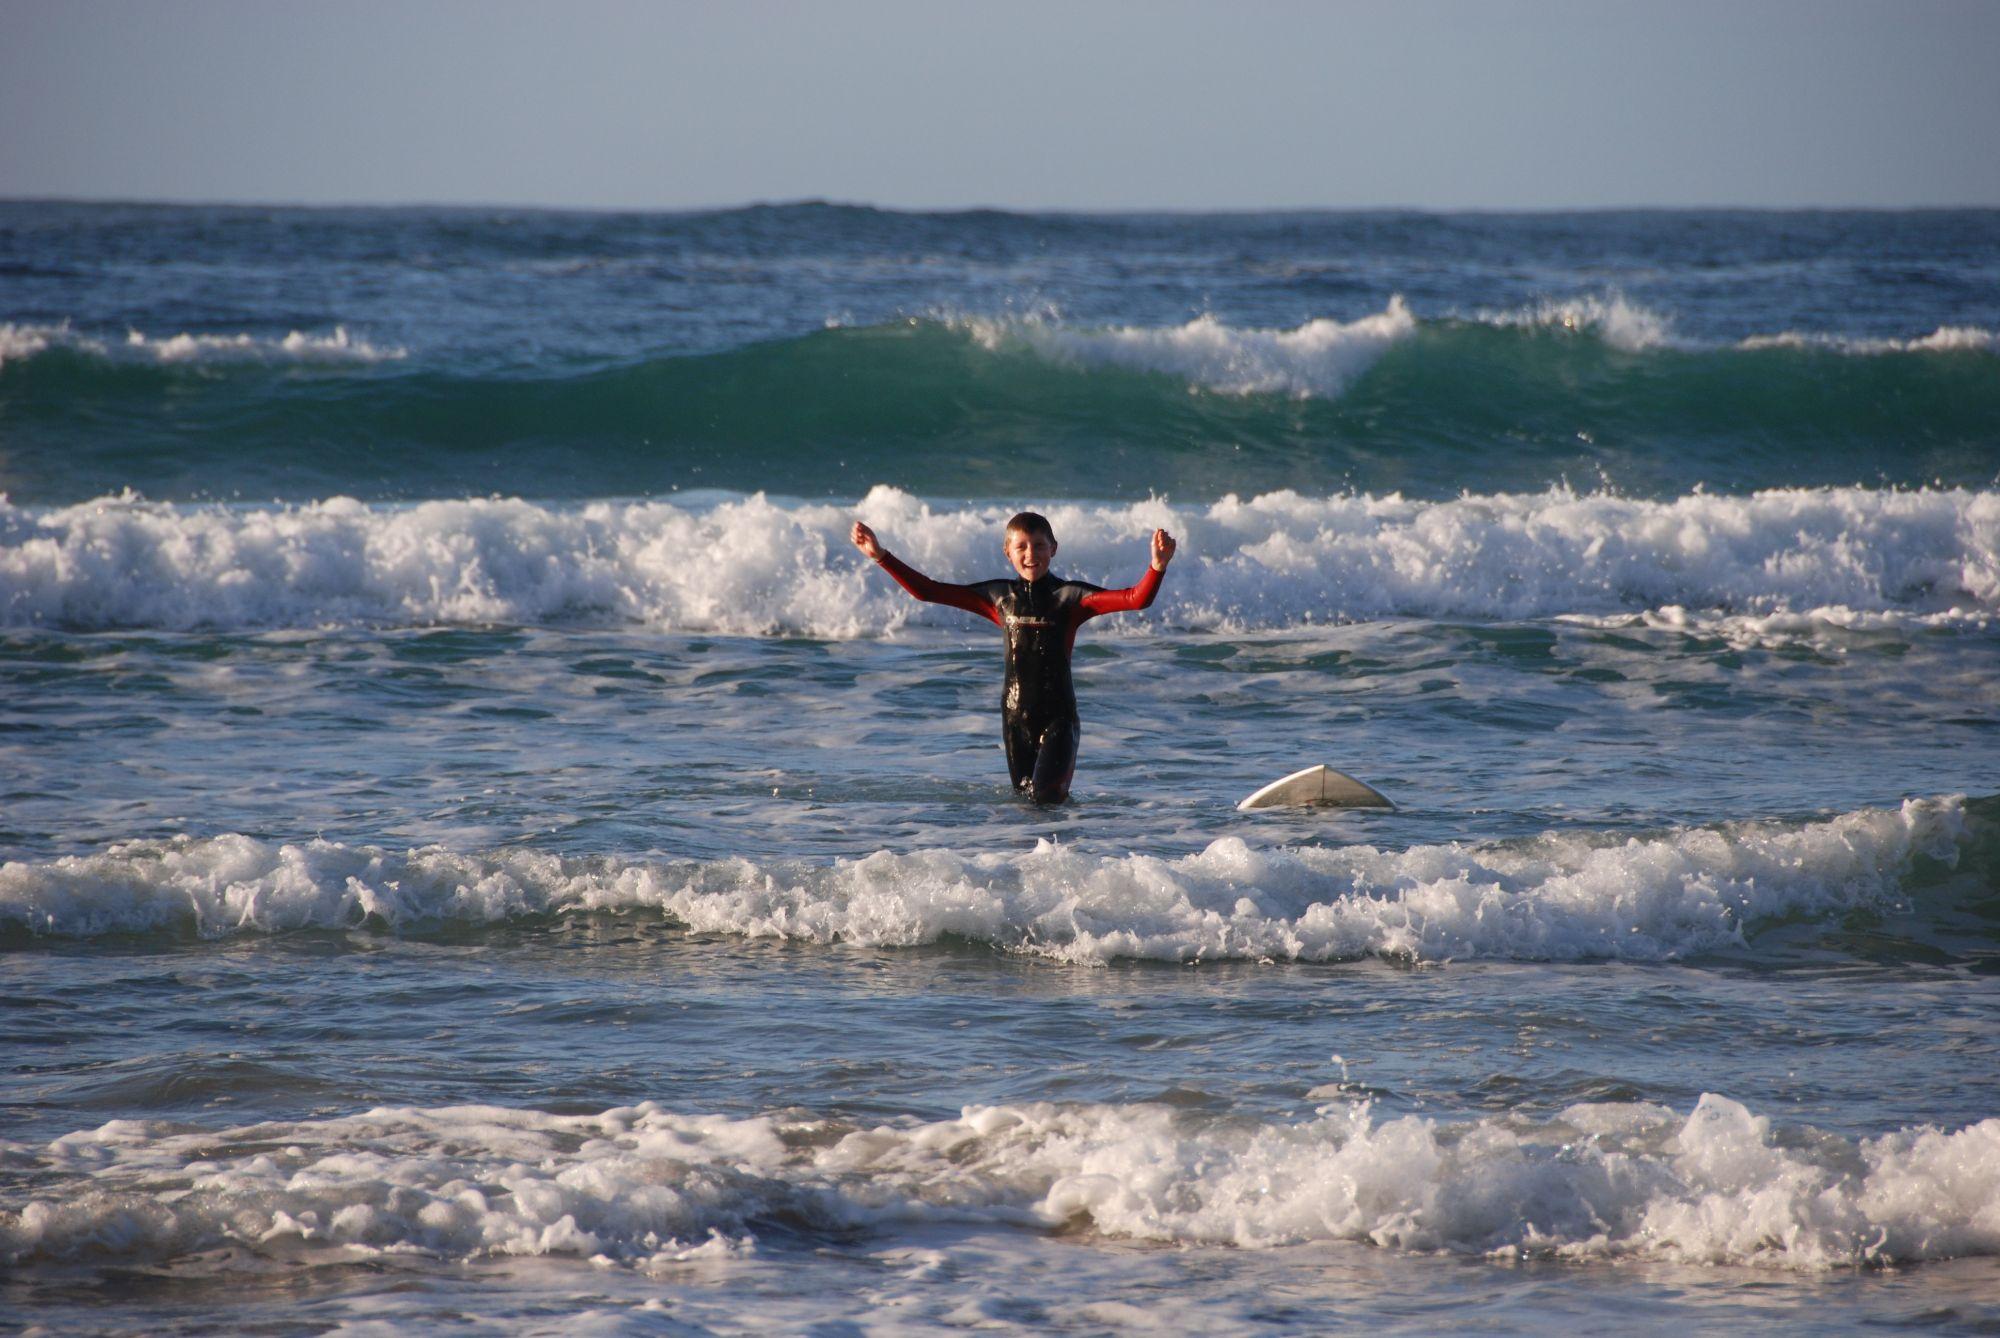 Surfing in Sennen Cove